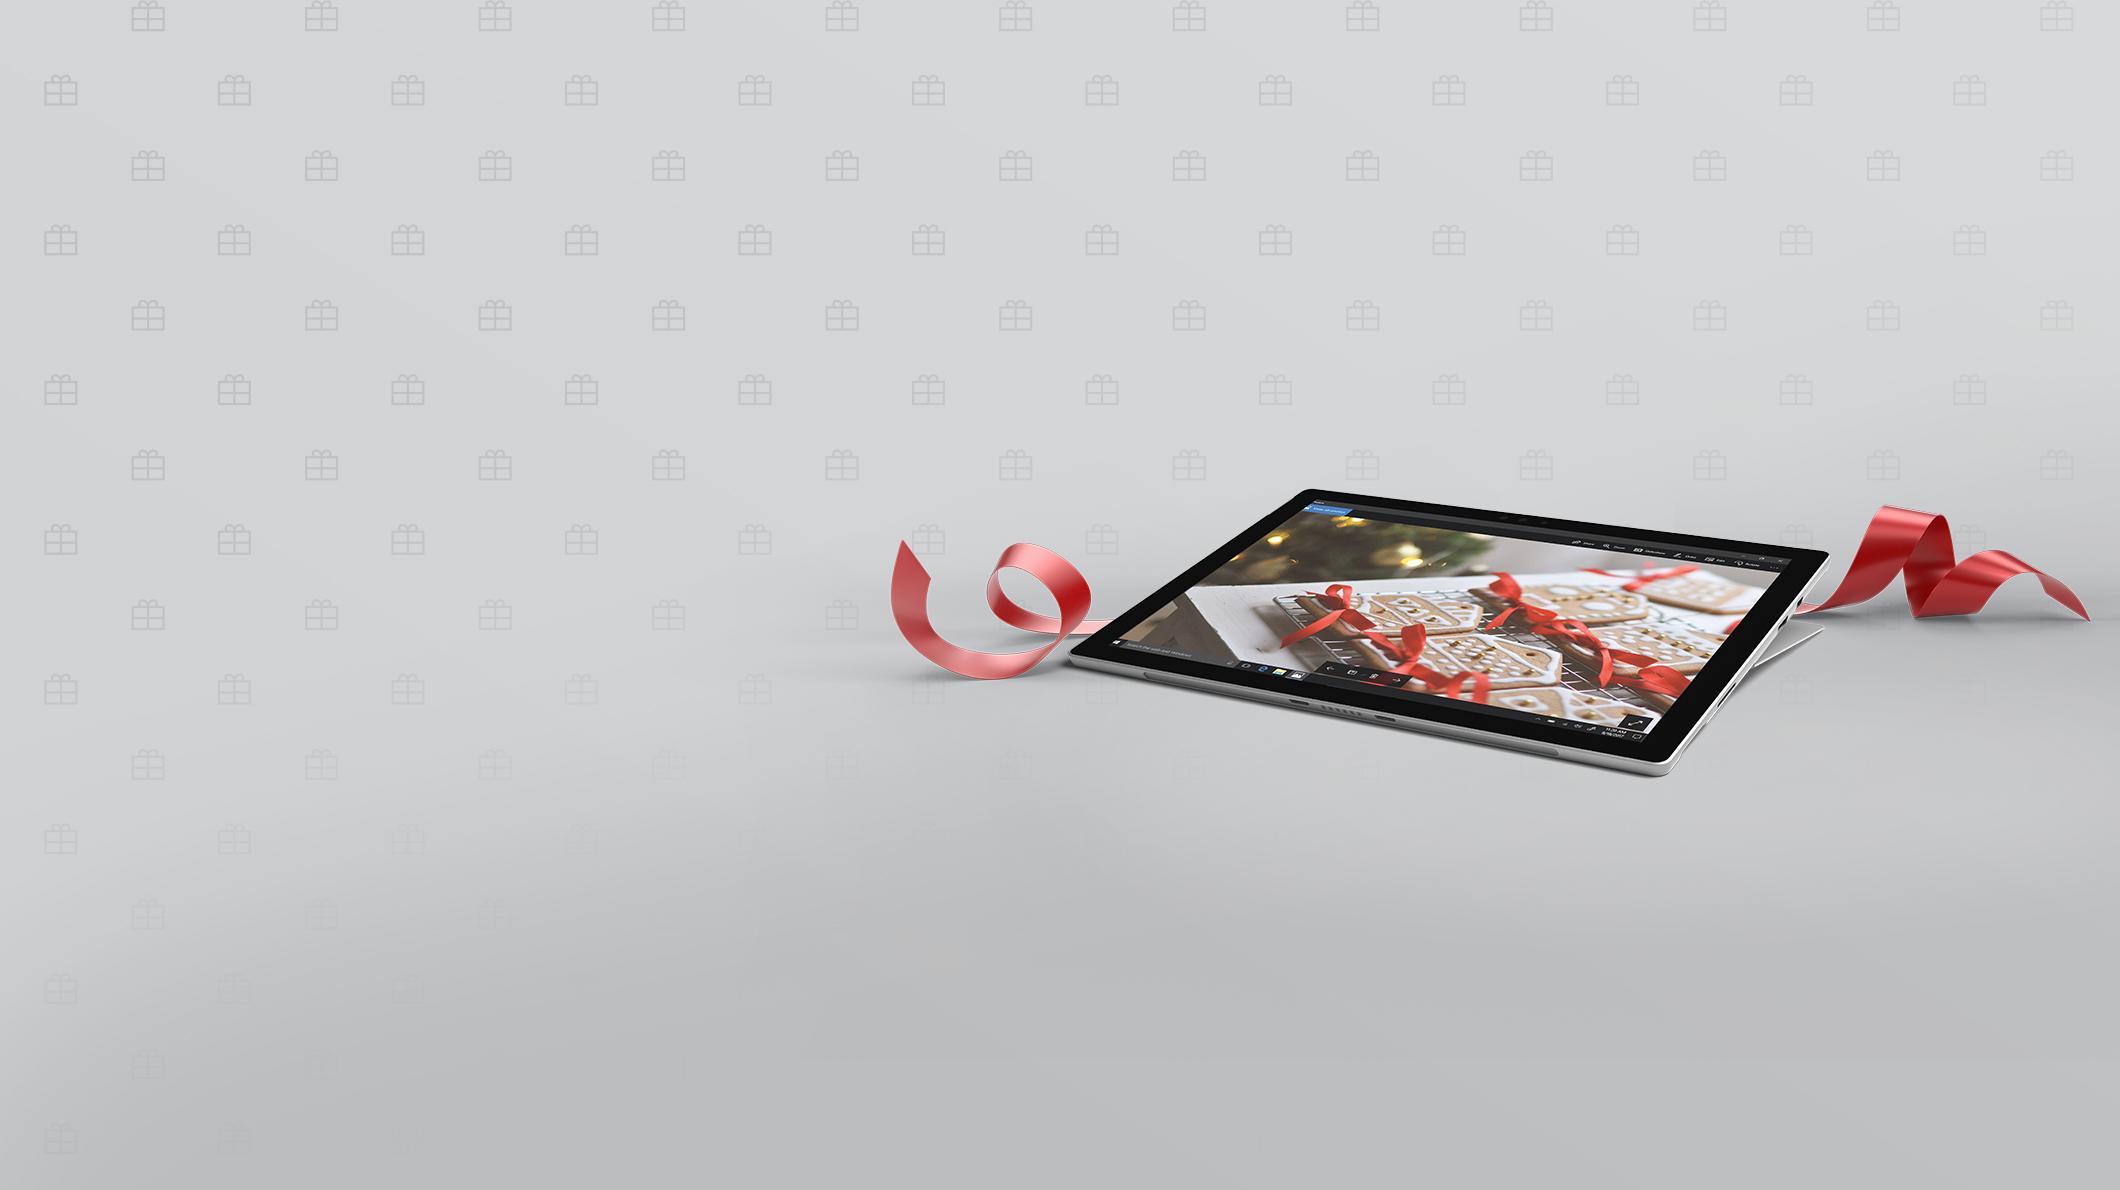 A Surface Pro